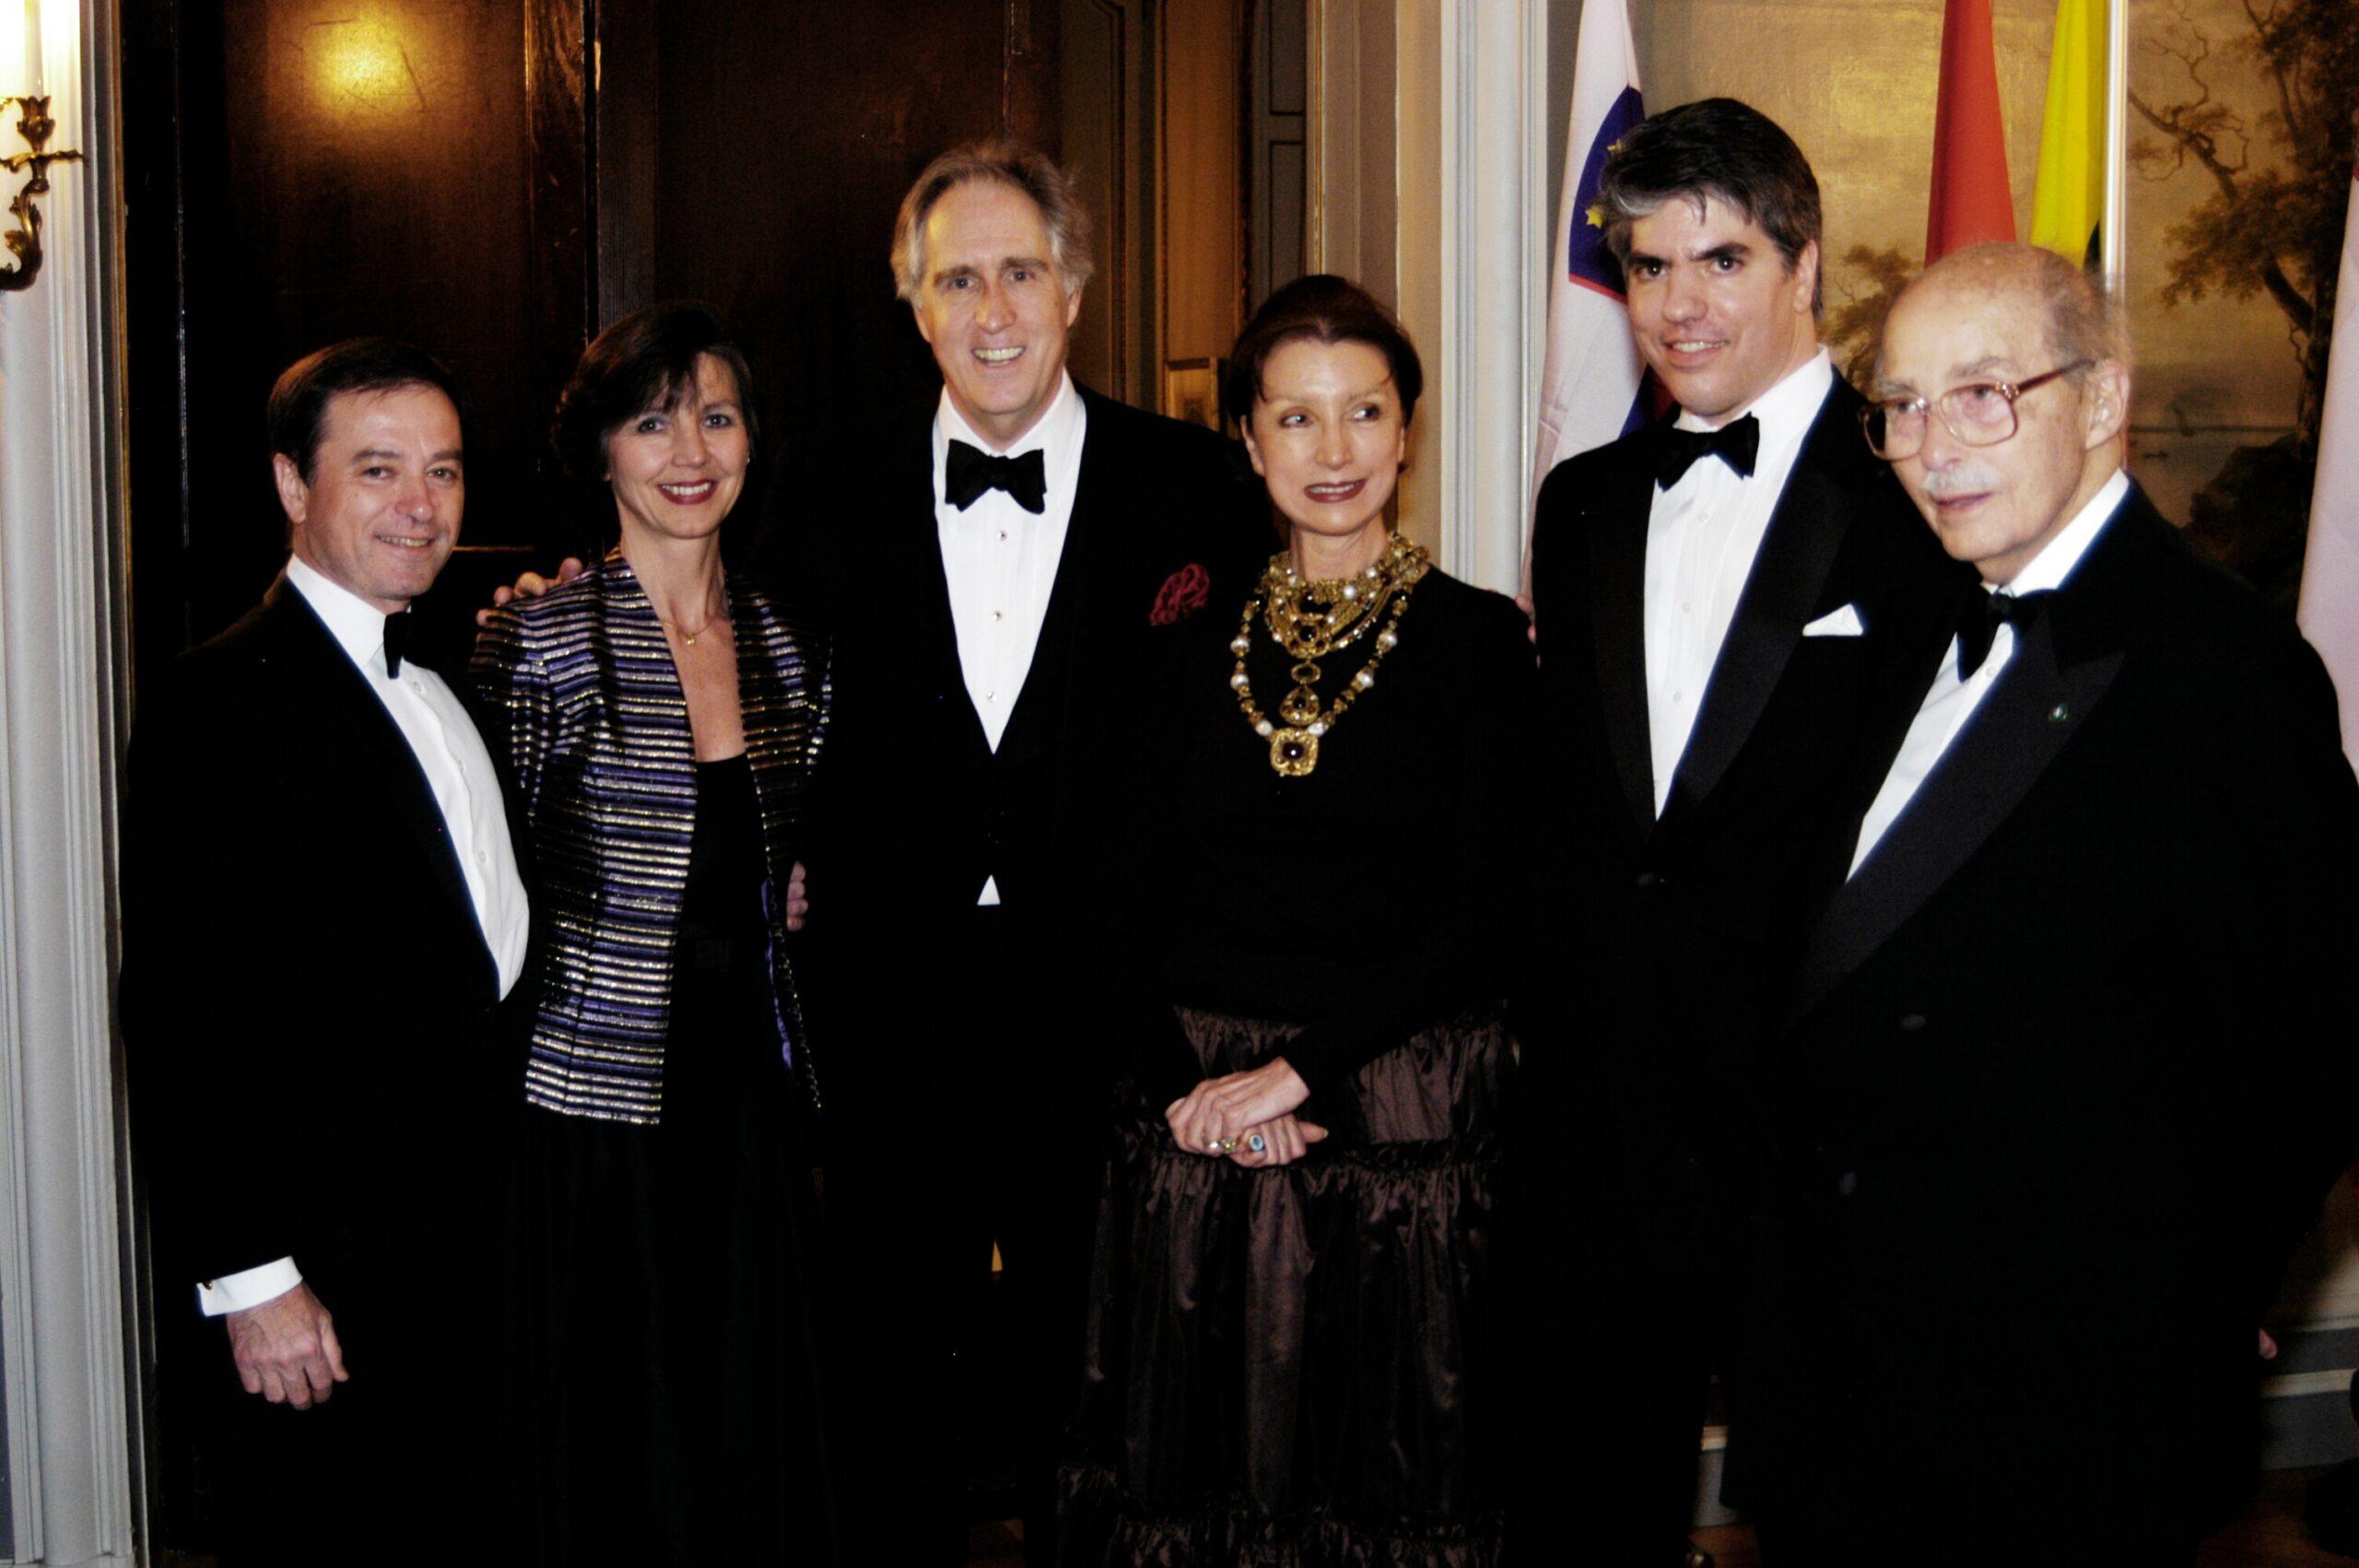 Ambassador András Simonyi, Mrs. Nadia Simonyi, Mr. Nash Whitney Schott, Mrs. Anikó Gaál-Schott, Mr. Maximilian N. Teleki, Dr. Ottó von Habsburg